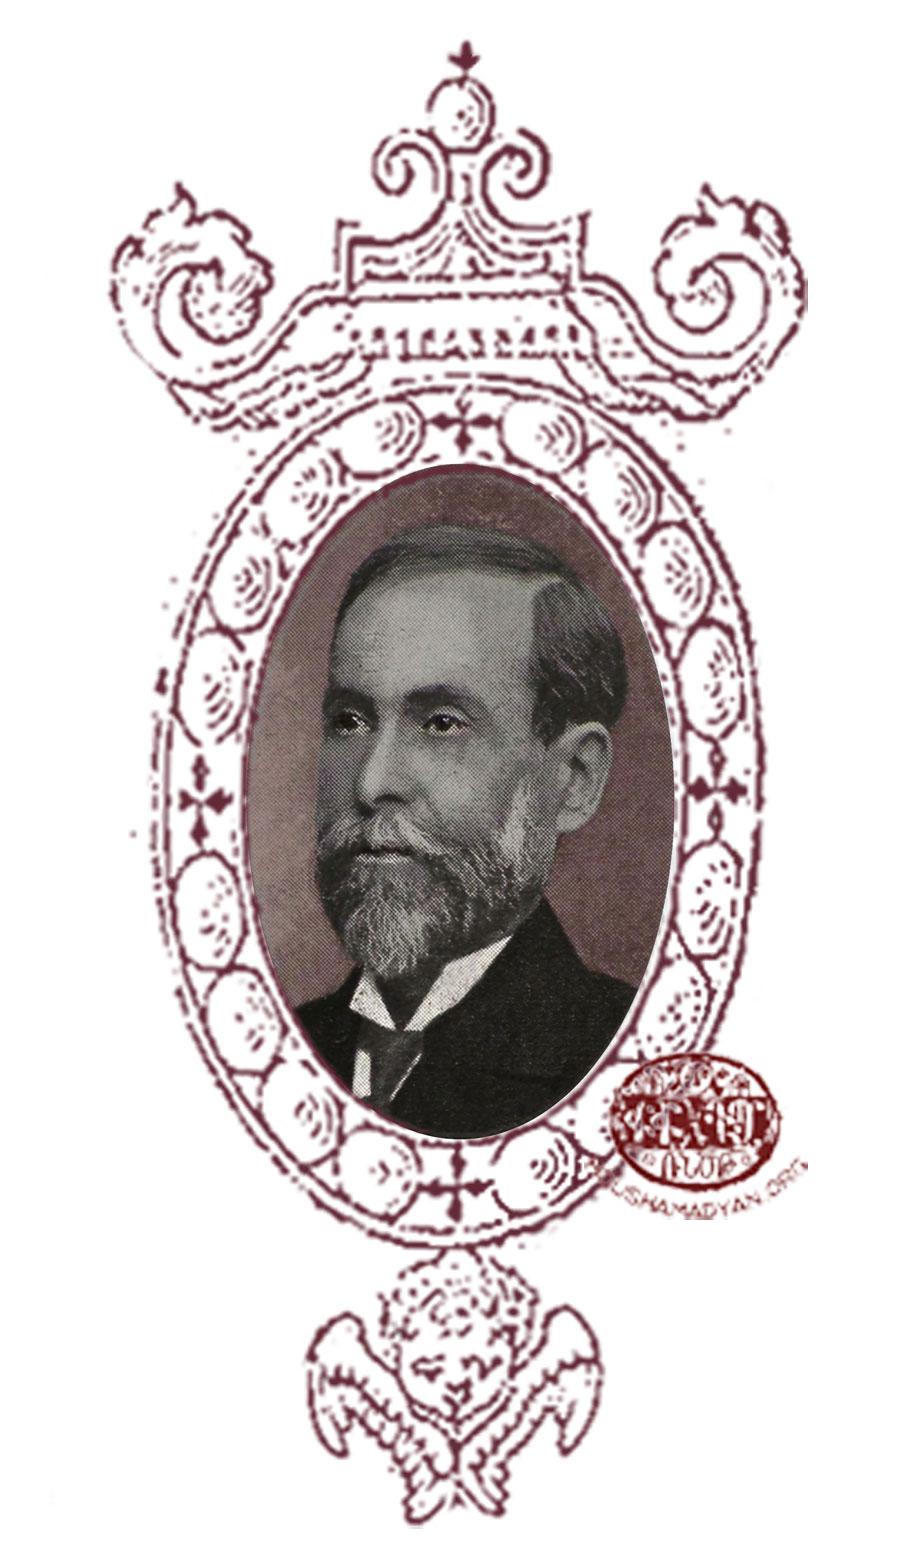 Nikoghos Tenekejian